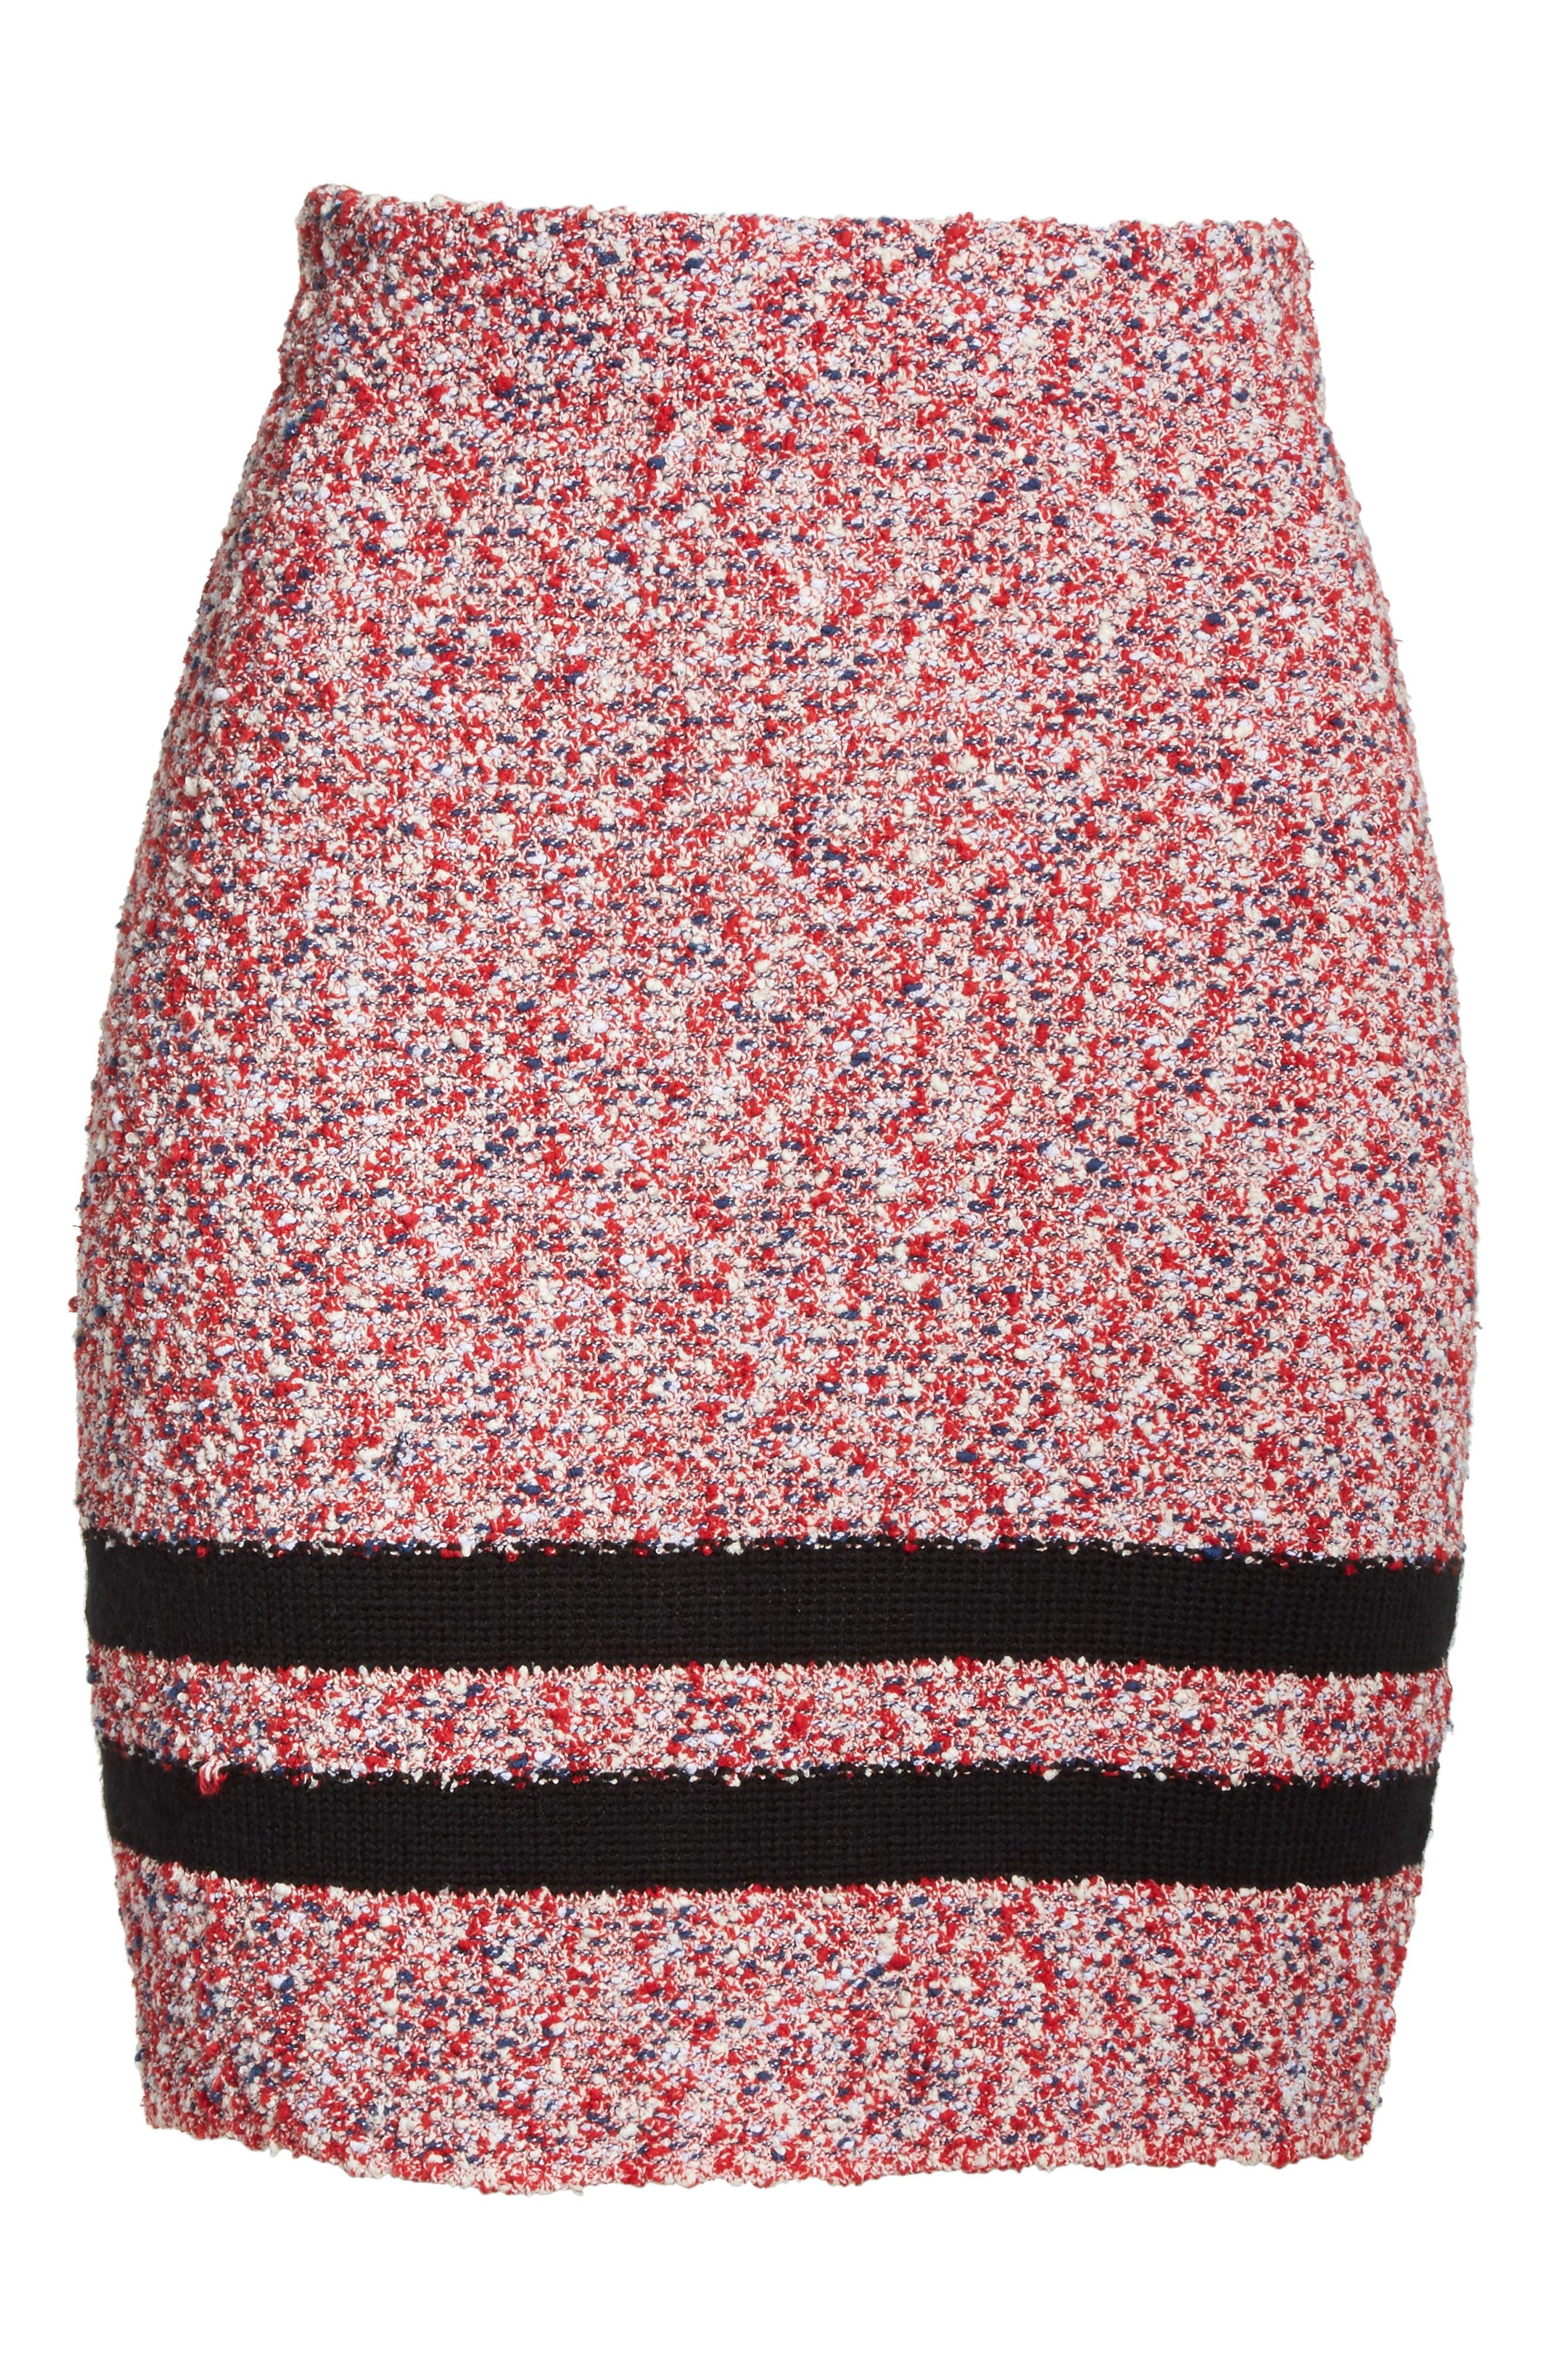 Halstead Tweed Skirt,                             Alternate thumbnail 6, color,                             Red